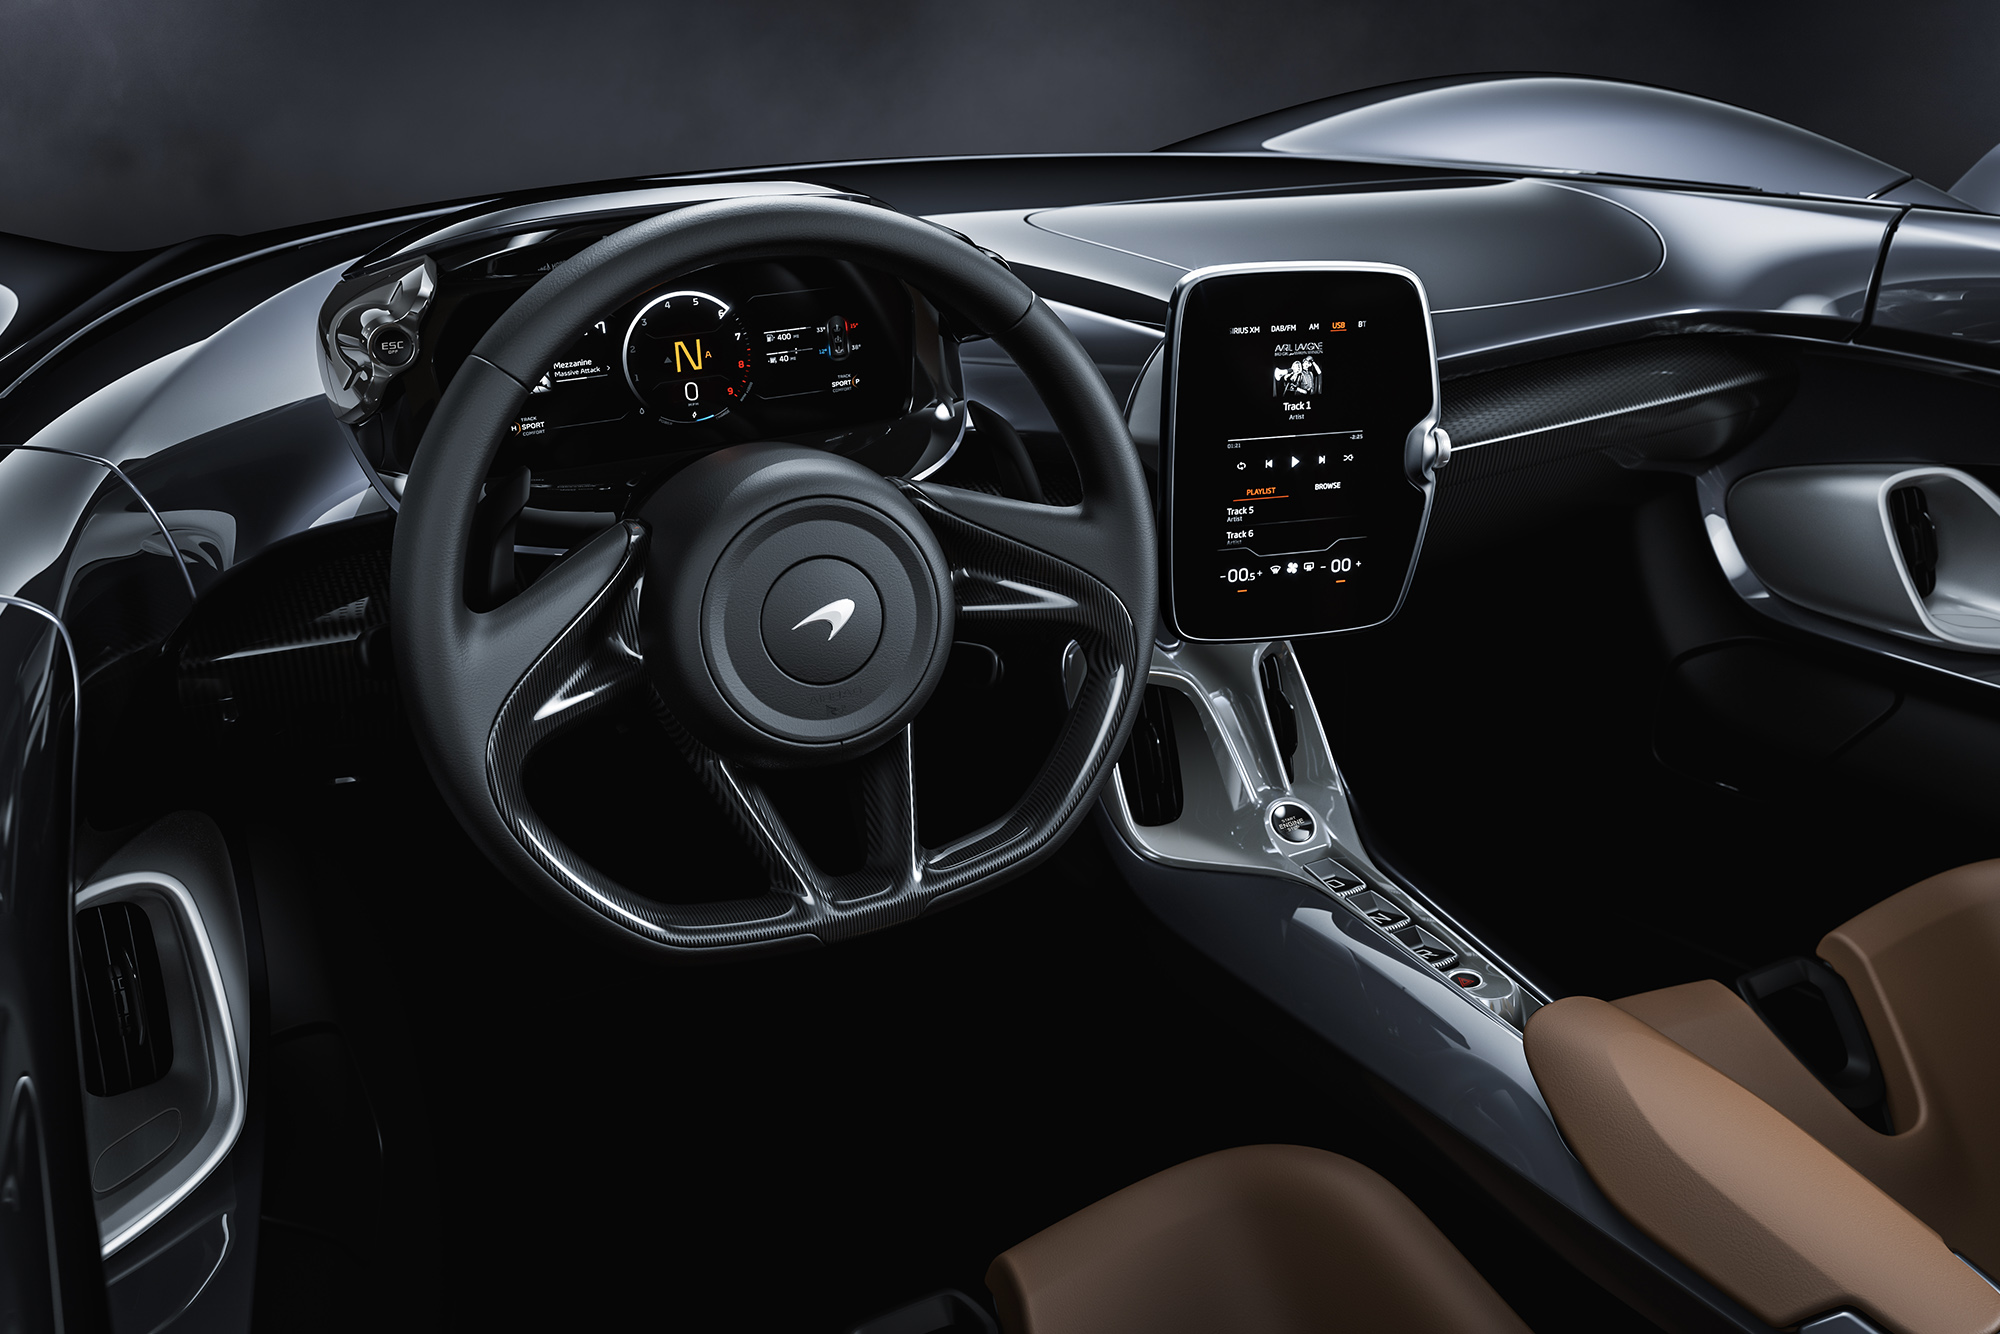 2019 McLaren Elva interior